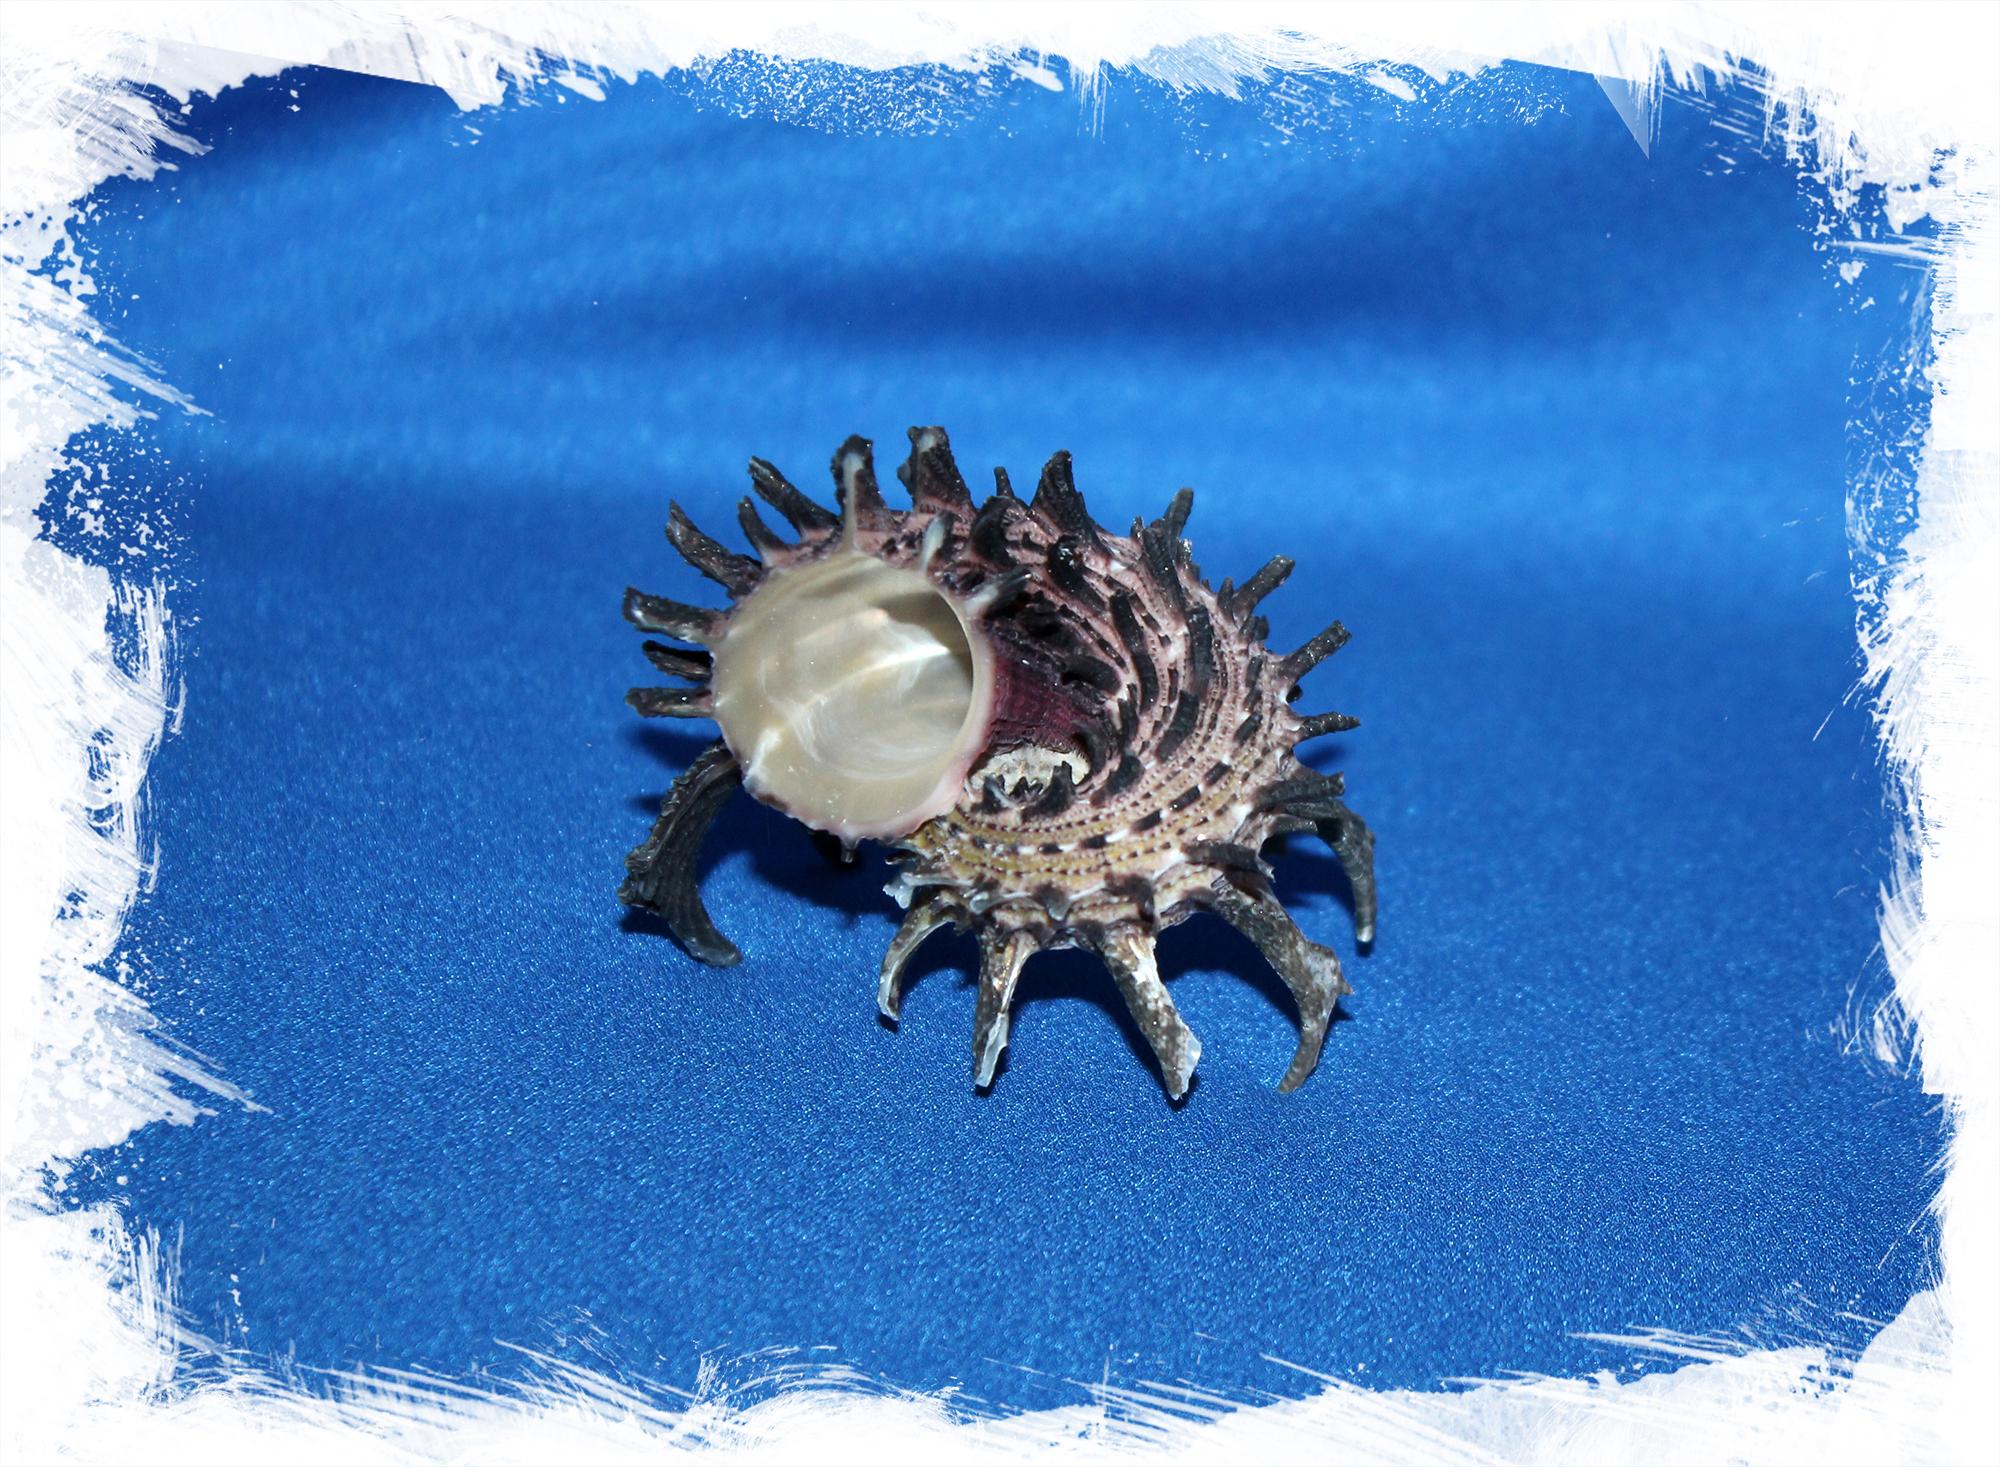 Раковина Ангария империалис, Ангария империалис, Angaria imperialis, Angaria melanacantha